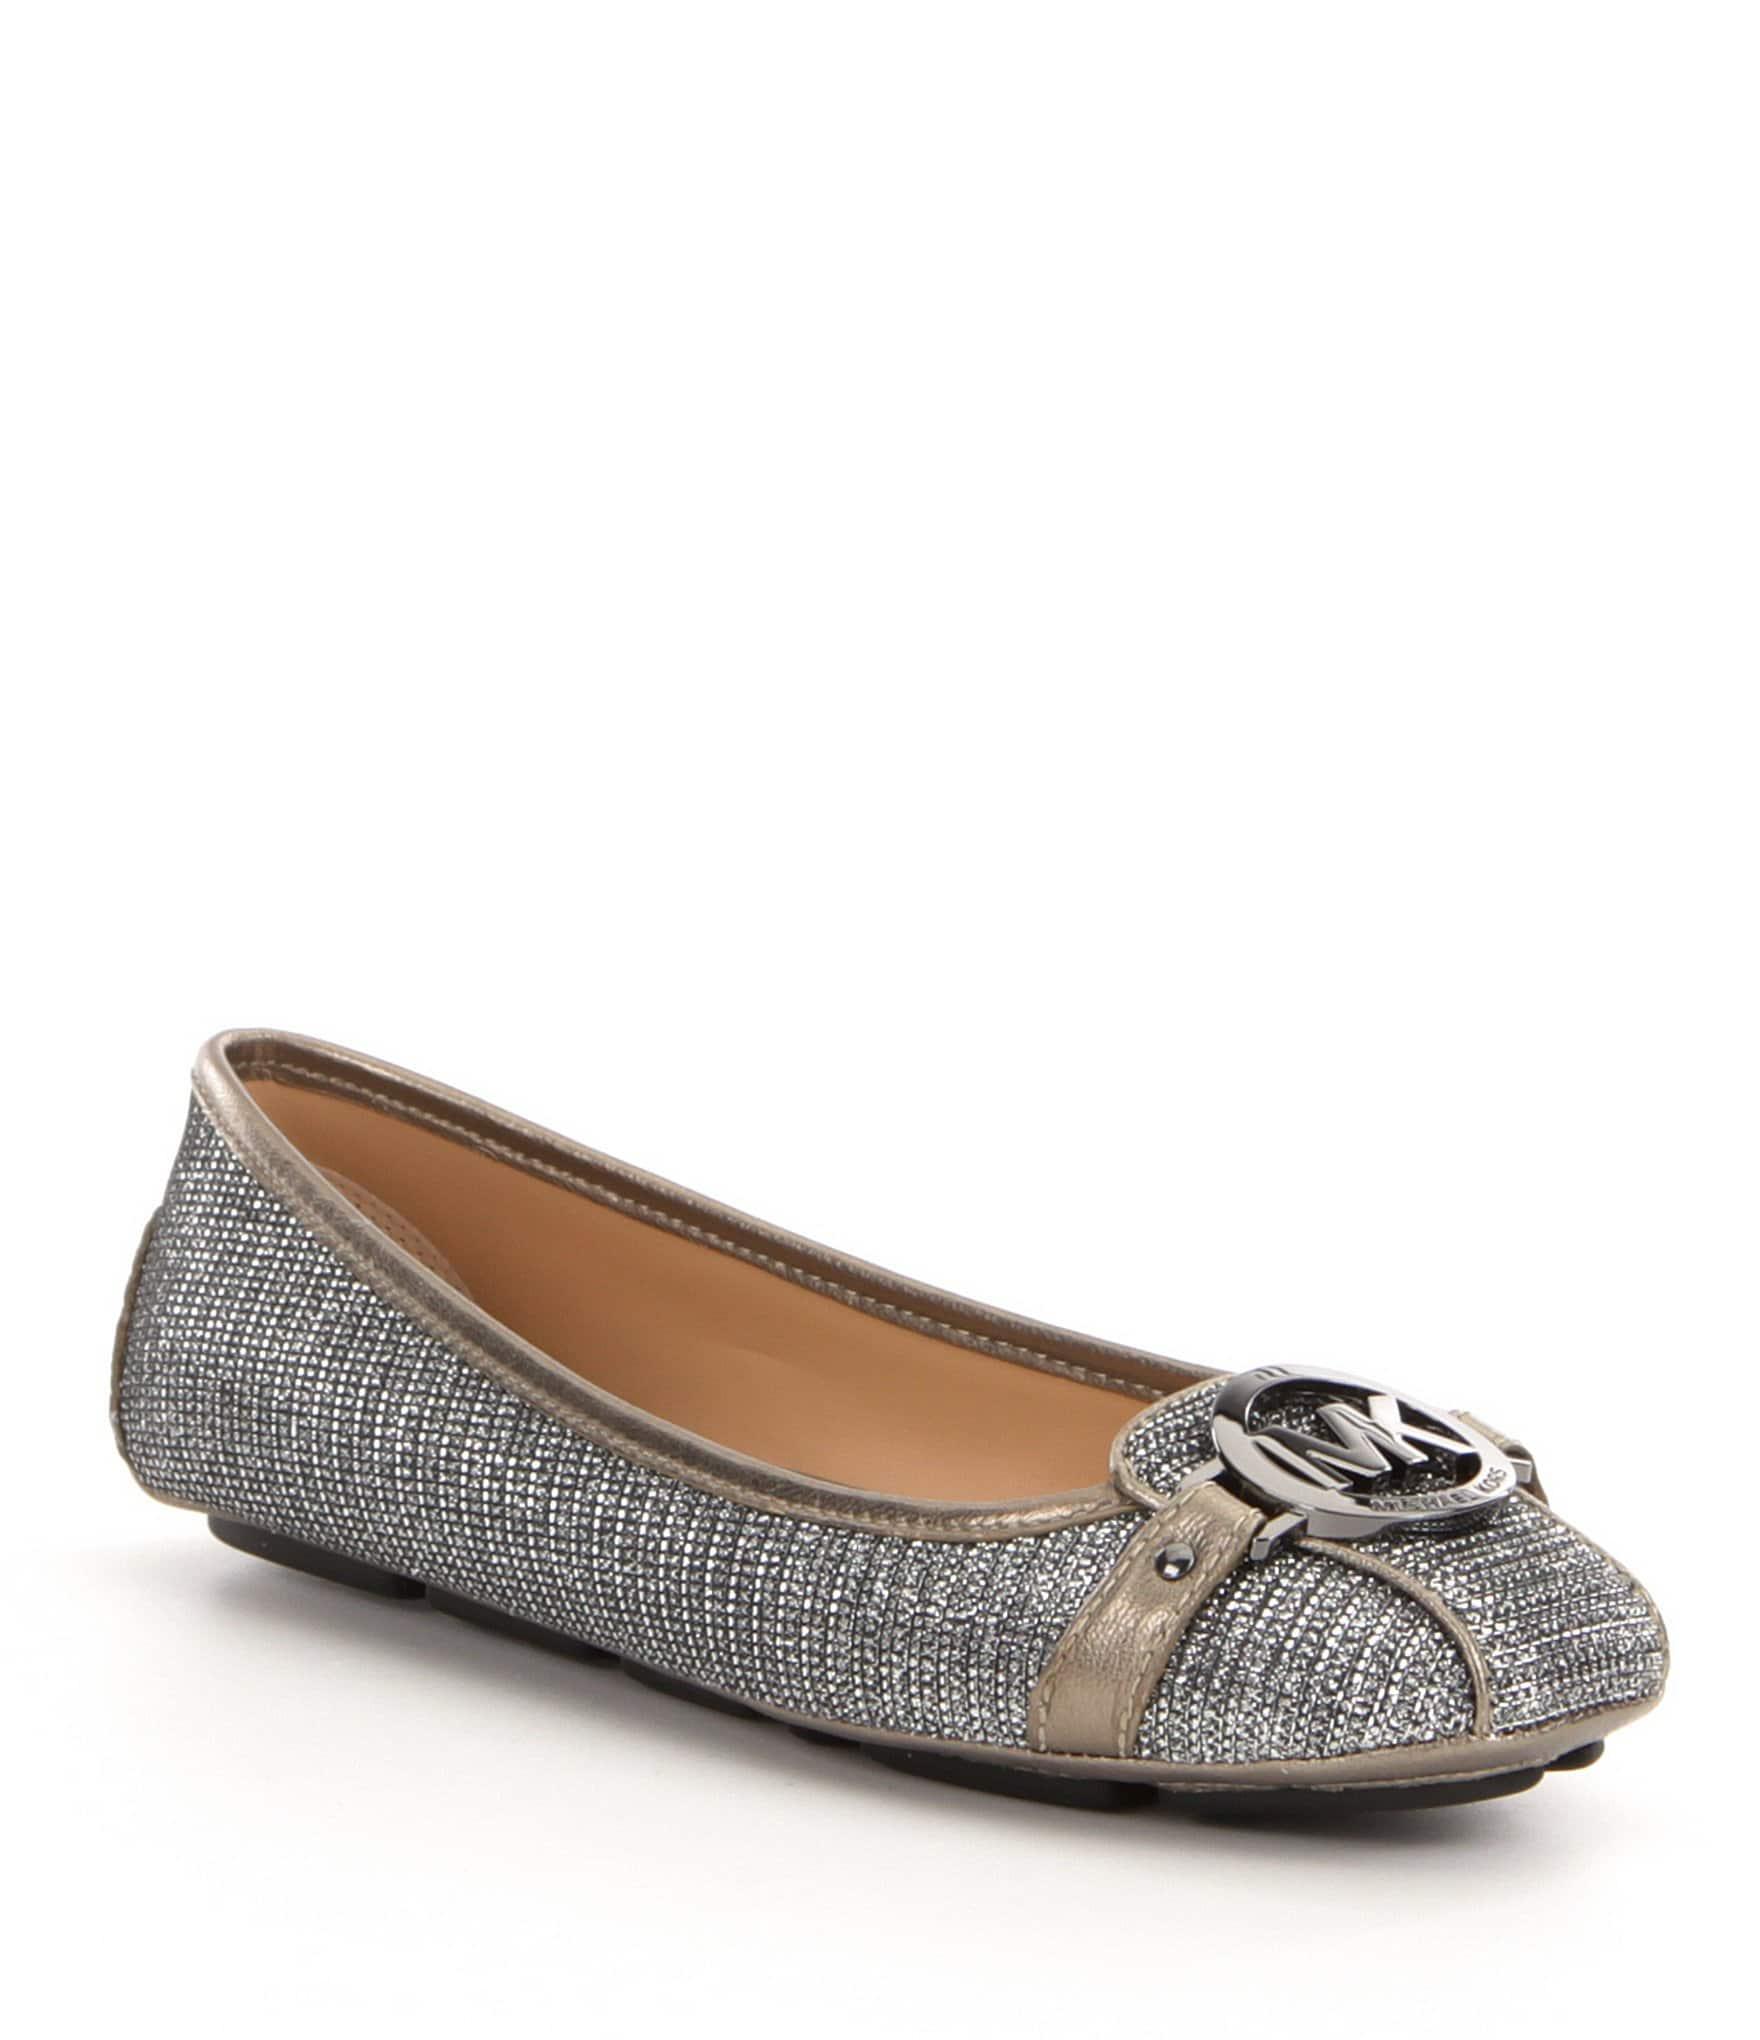 Michael Kors Fulton Black Shoes